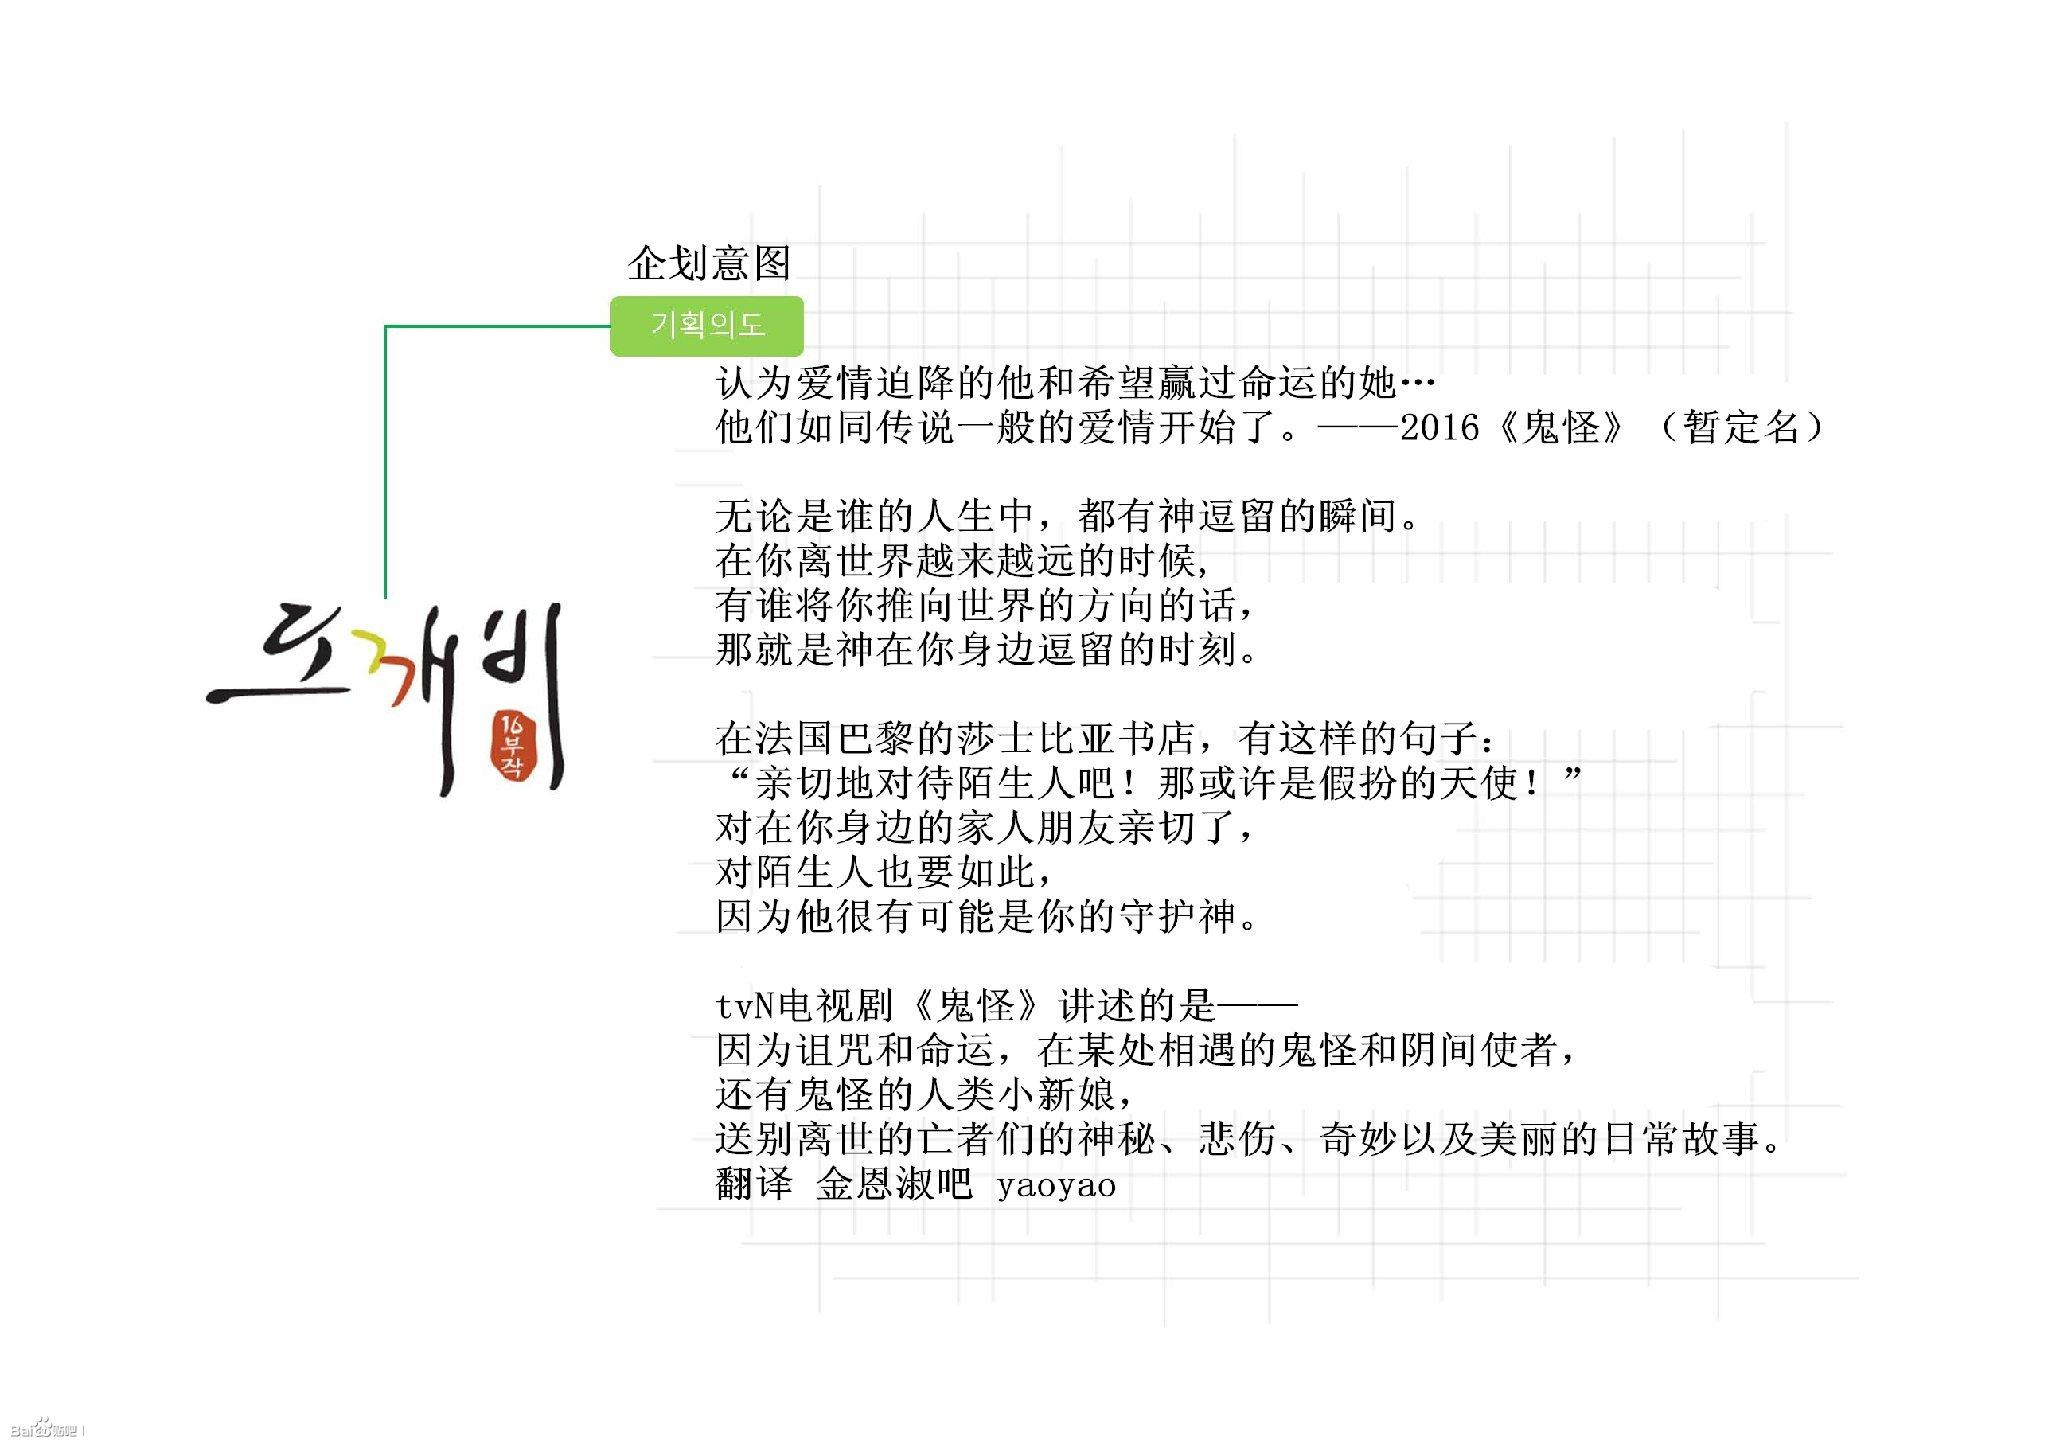 814c9c8fa0ec08fa7de05c1c51ee3d6d54fbda7c.jpg